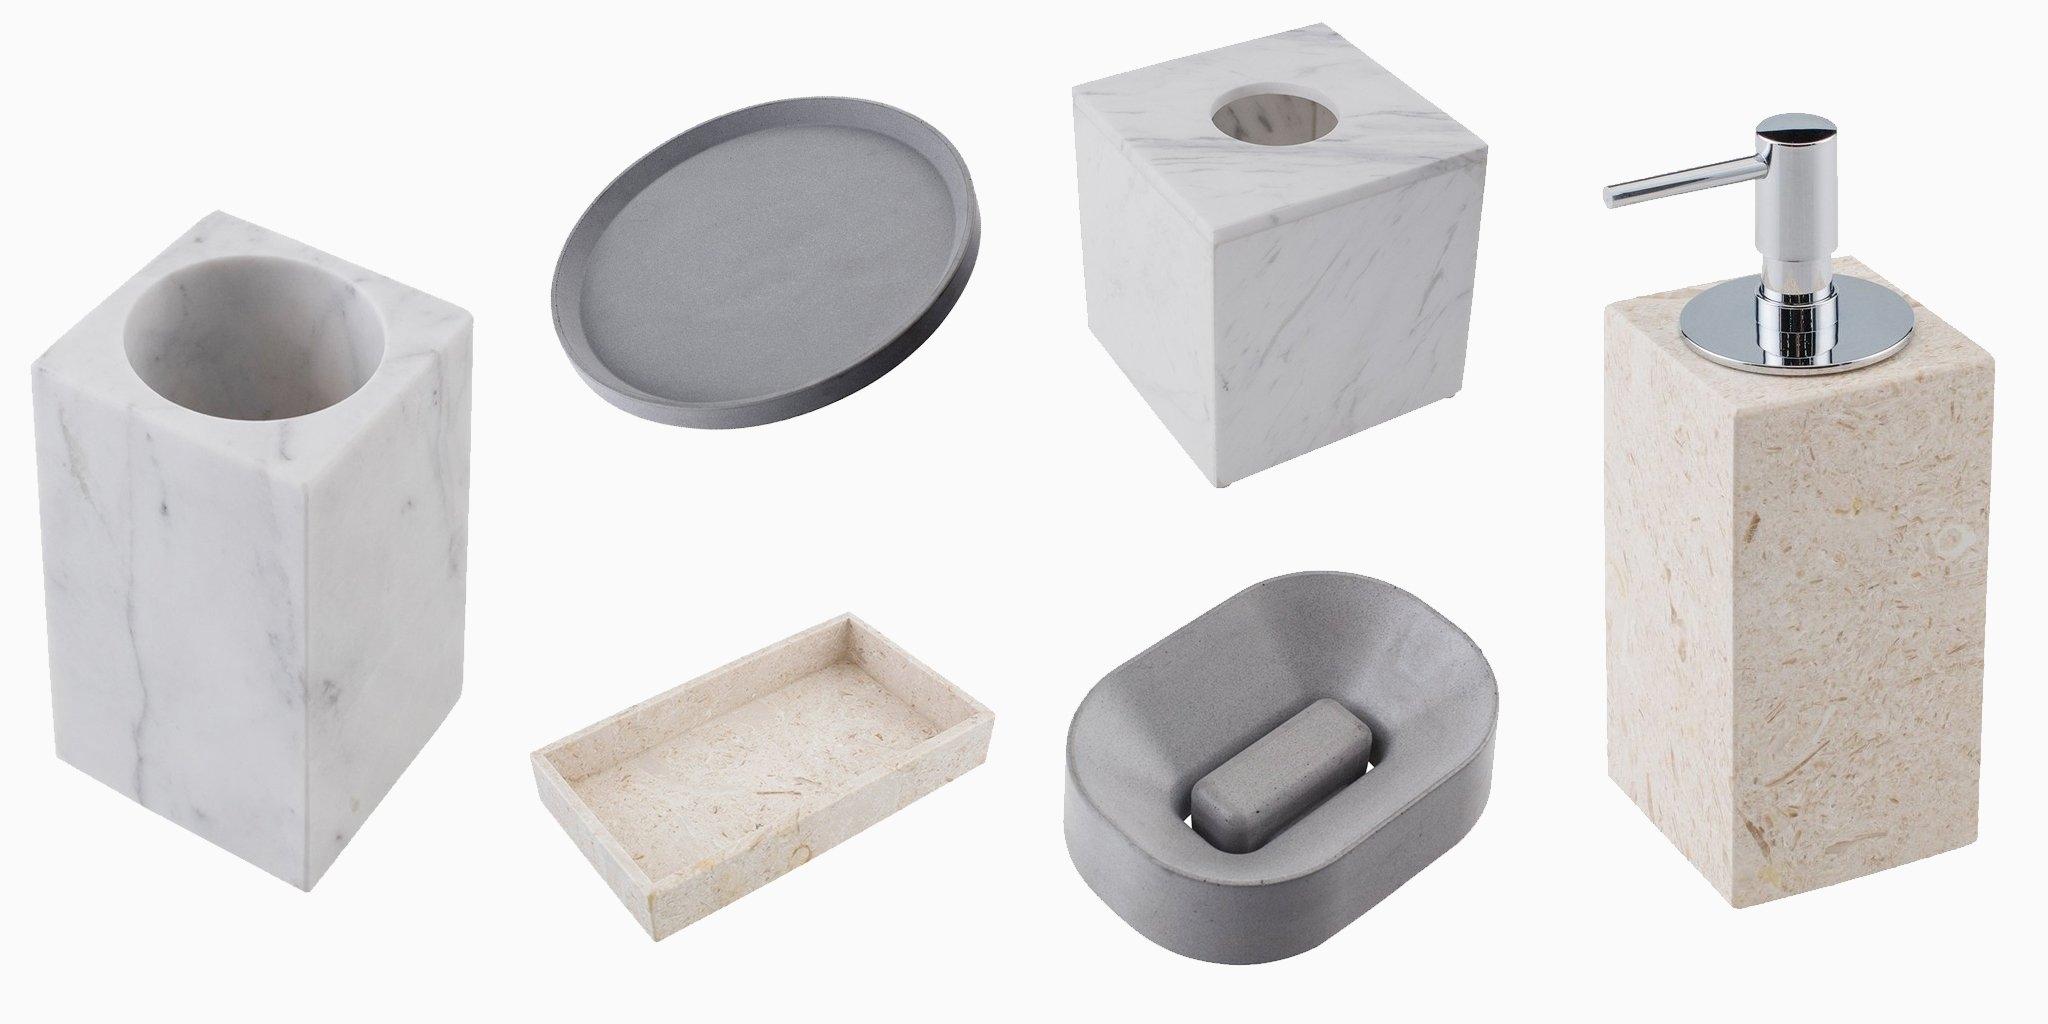 countertop accessories